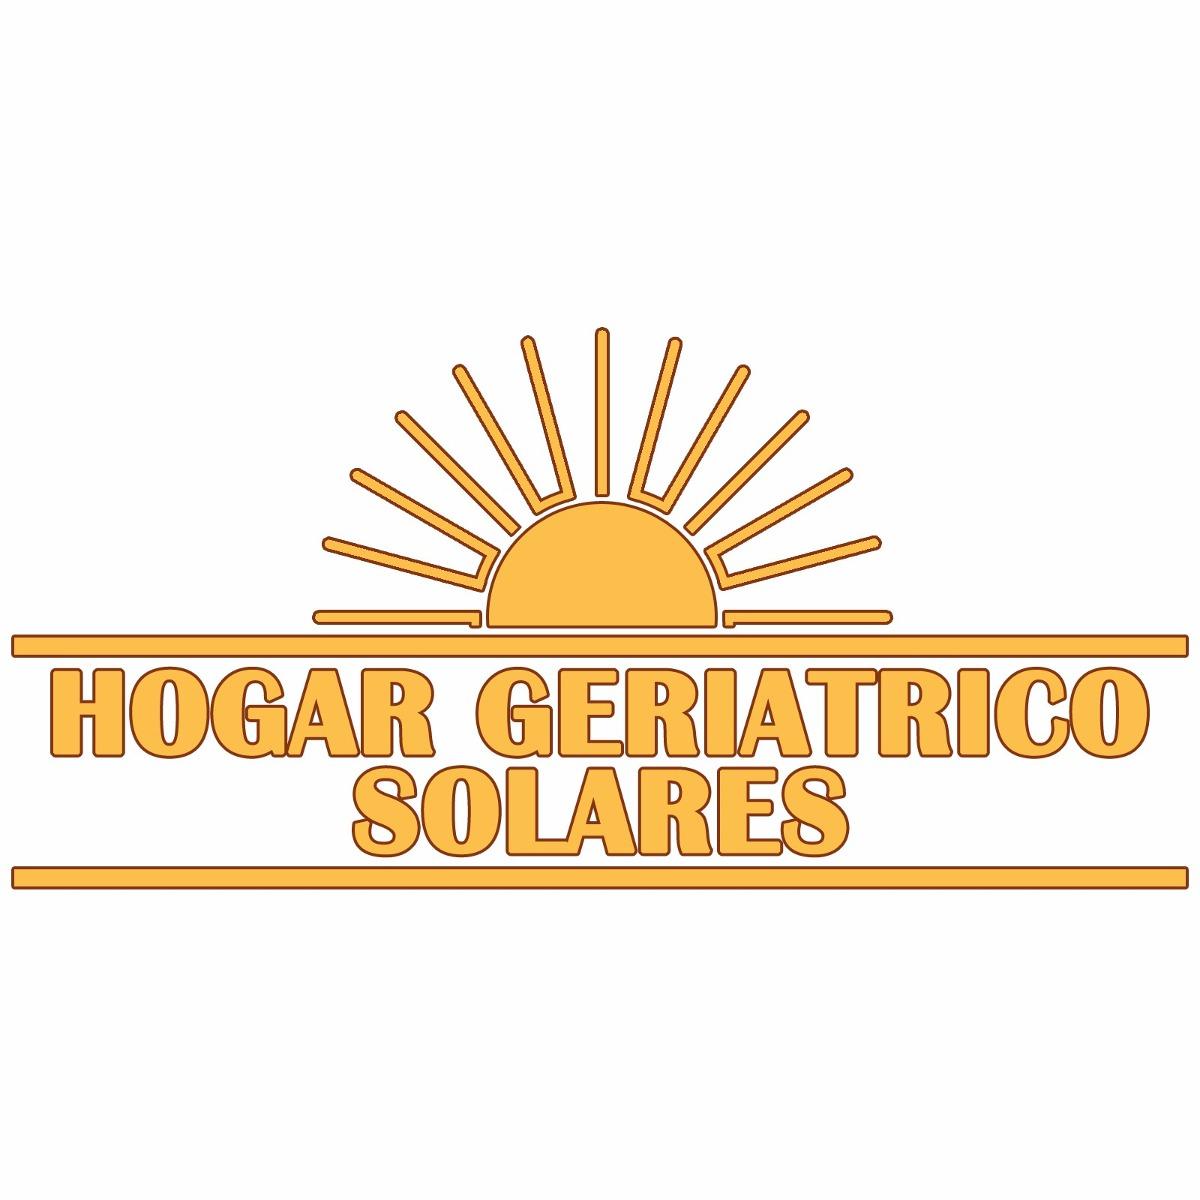 Hogar Geriatrico Solares Jos C Paz En Mercado Libre